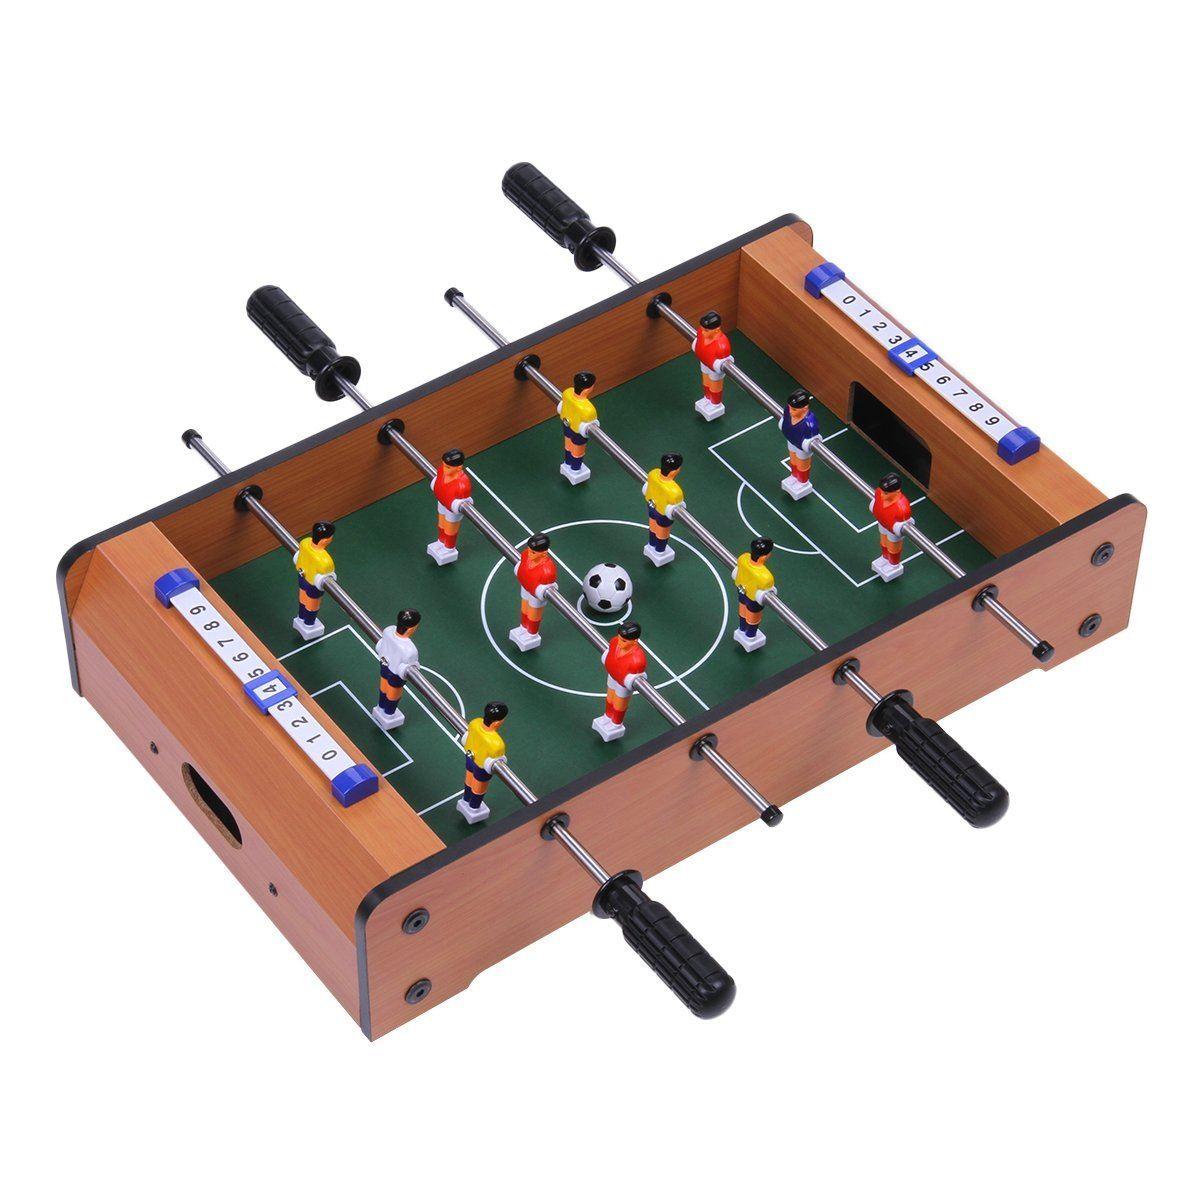 20 mini table top portable football hockey pool game set kids family fun gift ebay. Black Bedroom Furniture Sets. Home Design Ideas